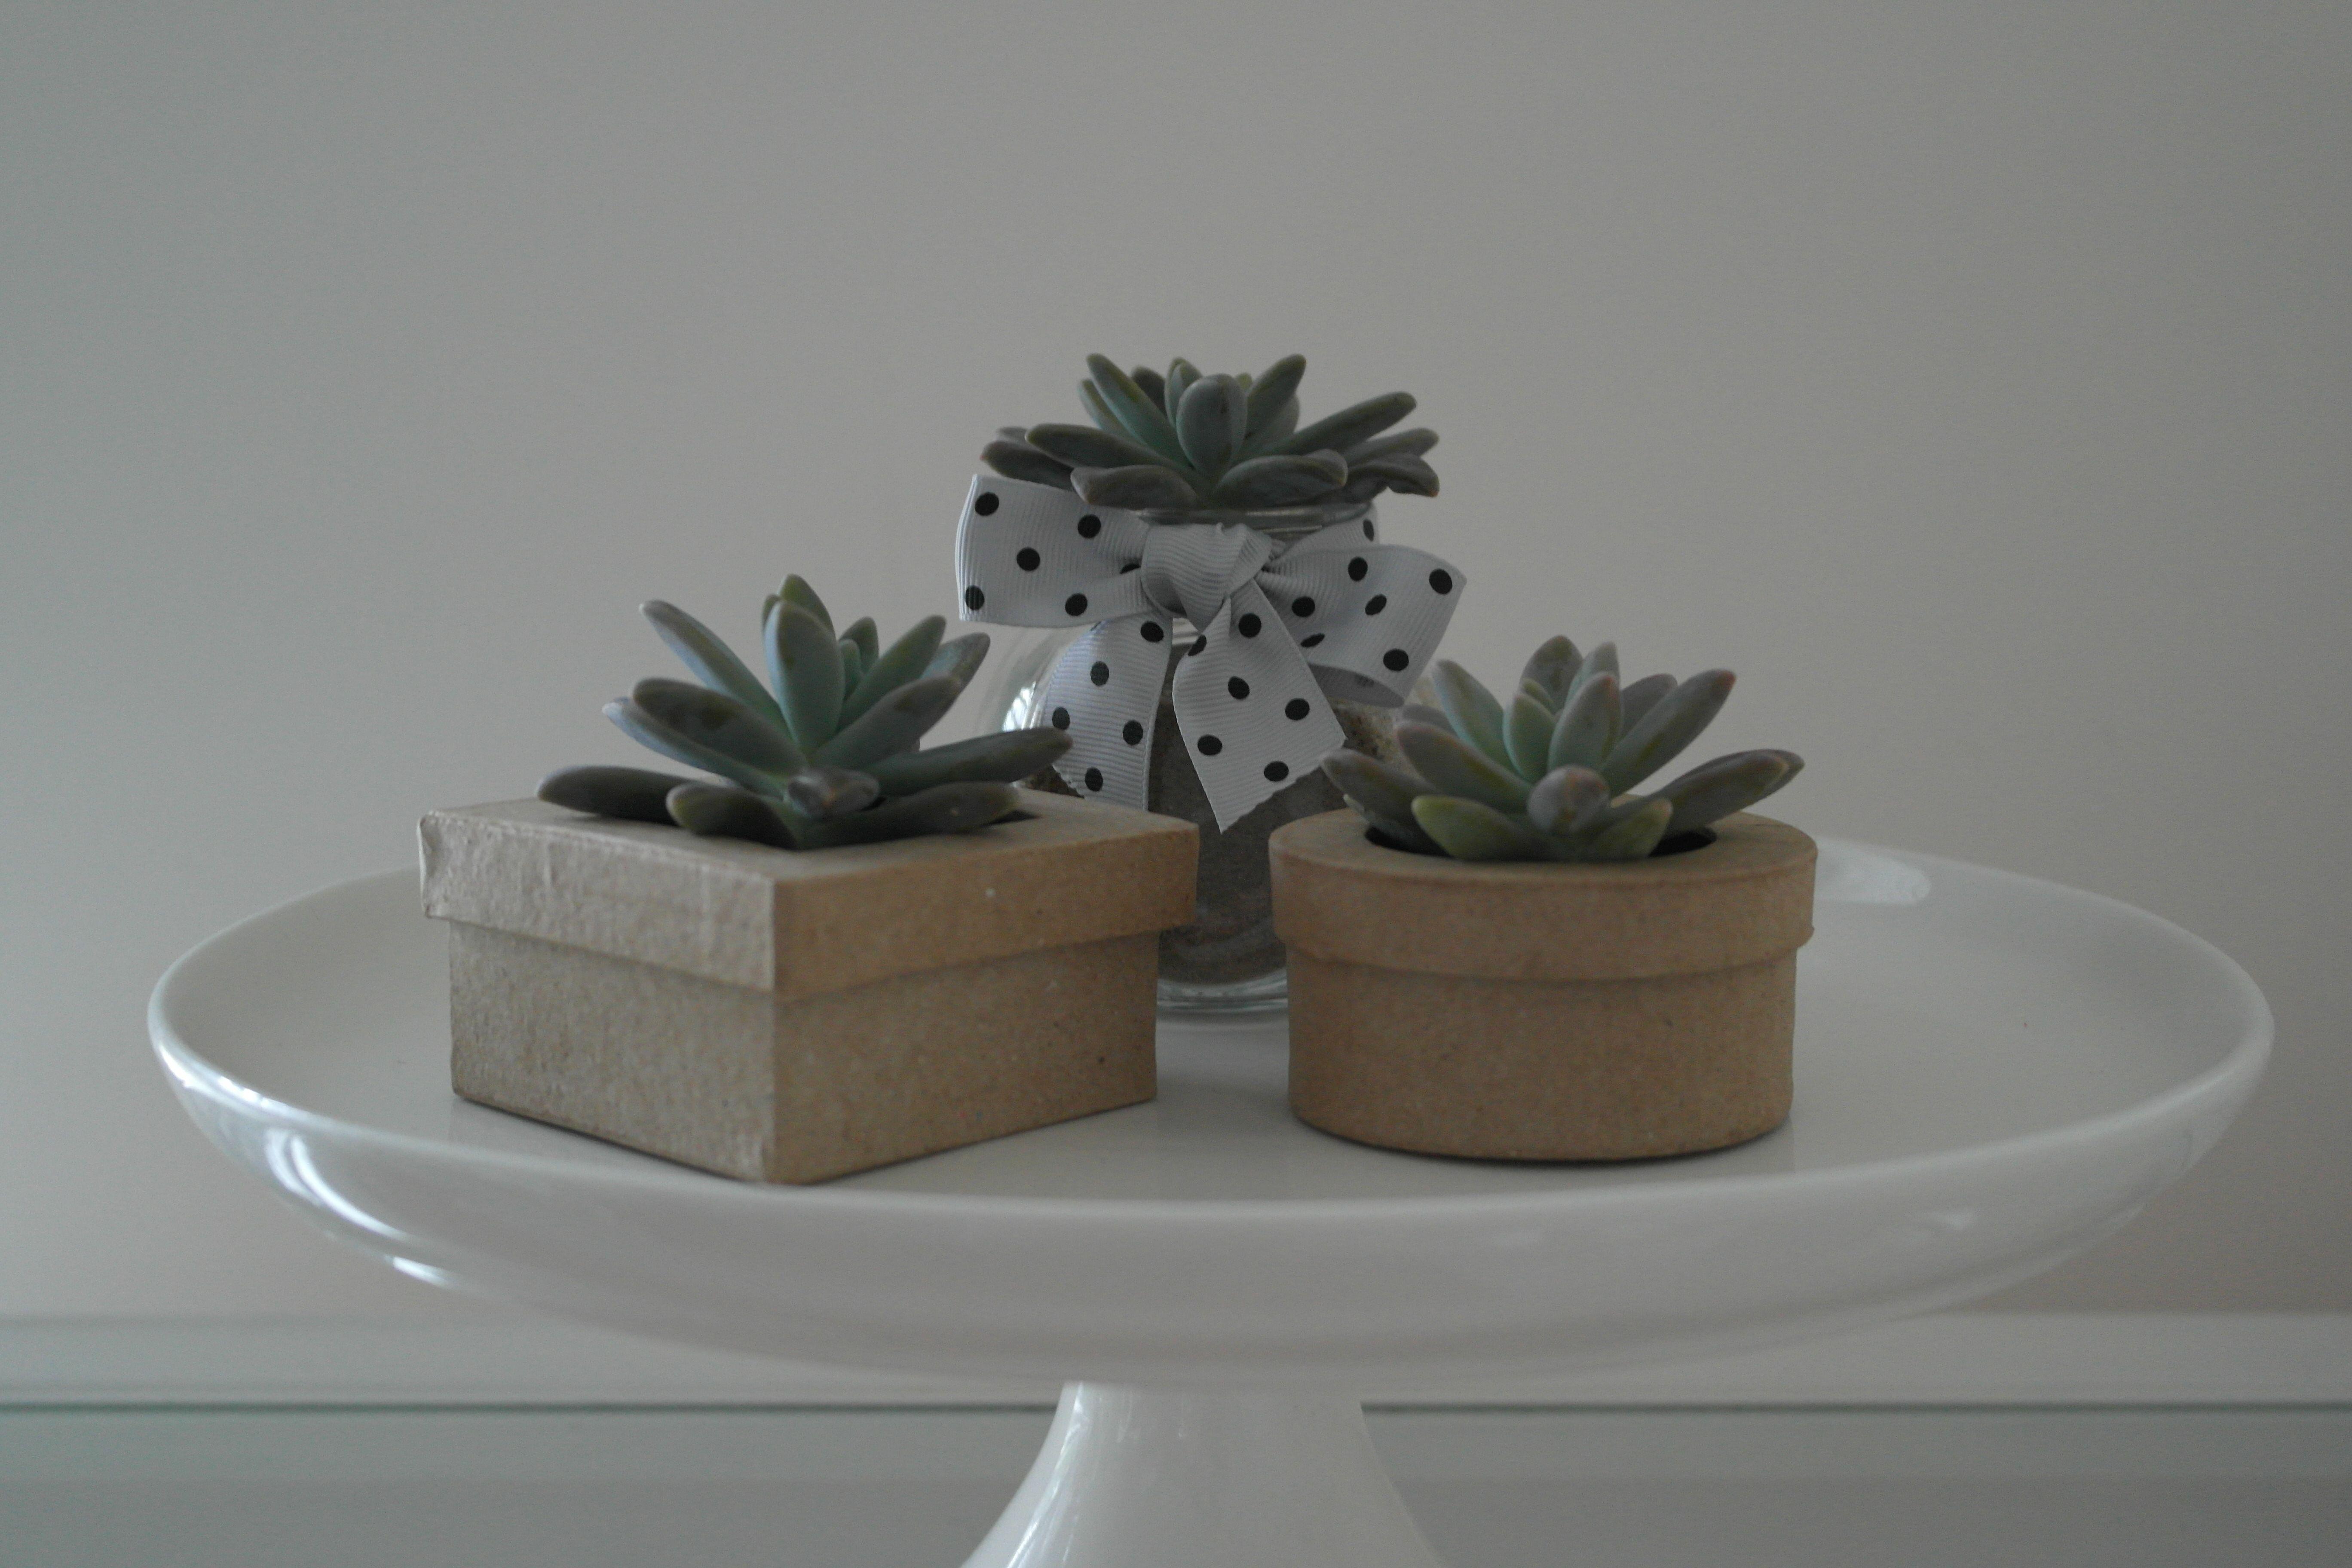 Cute little ideas for wedding bomboniere's using Succulents. Cara Clark Design www.caraclarkdesign.com